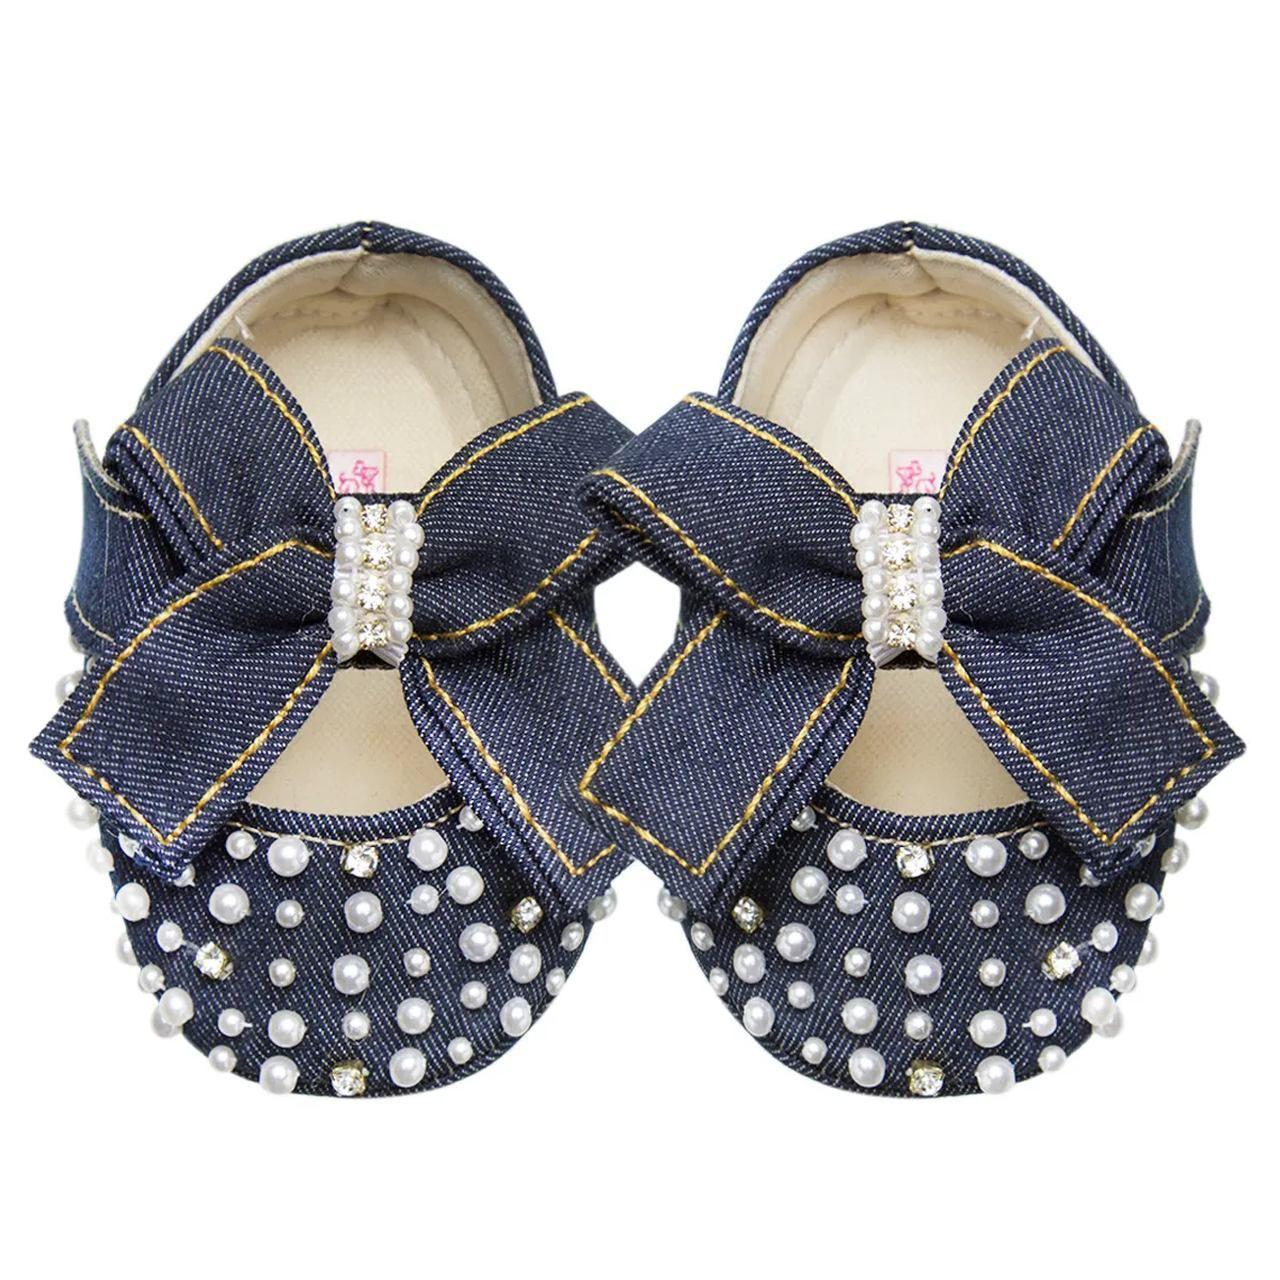 Sapatilha Luxo Jeans Pérolas